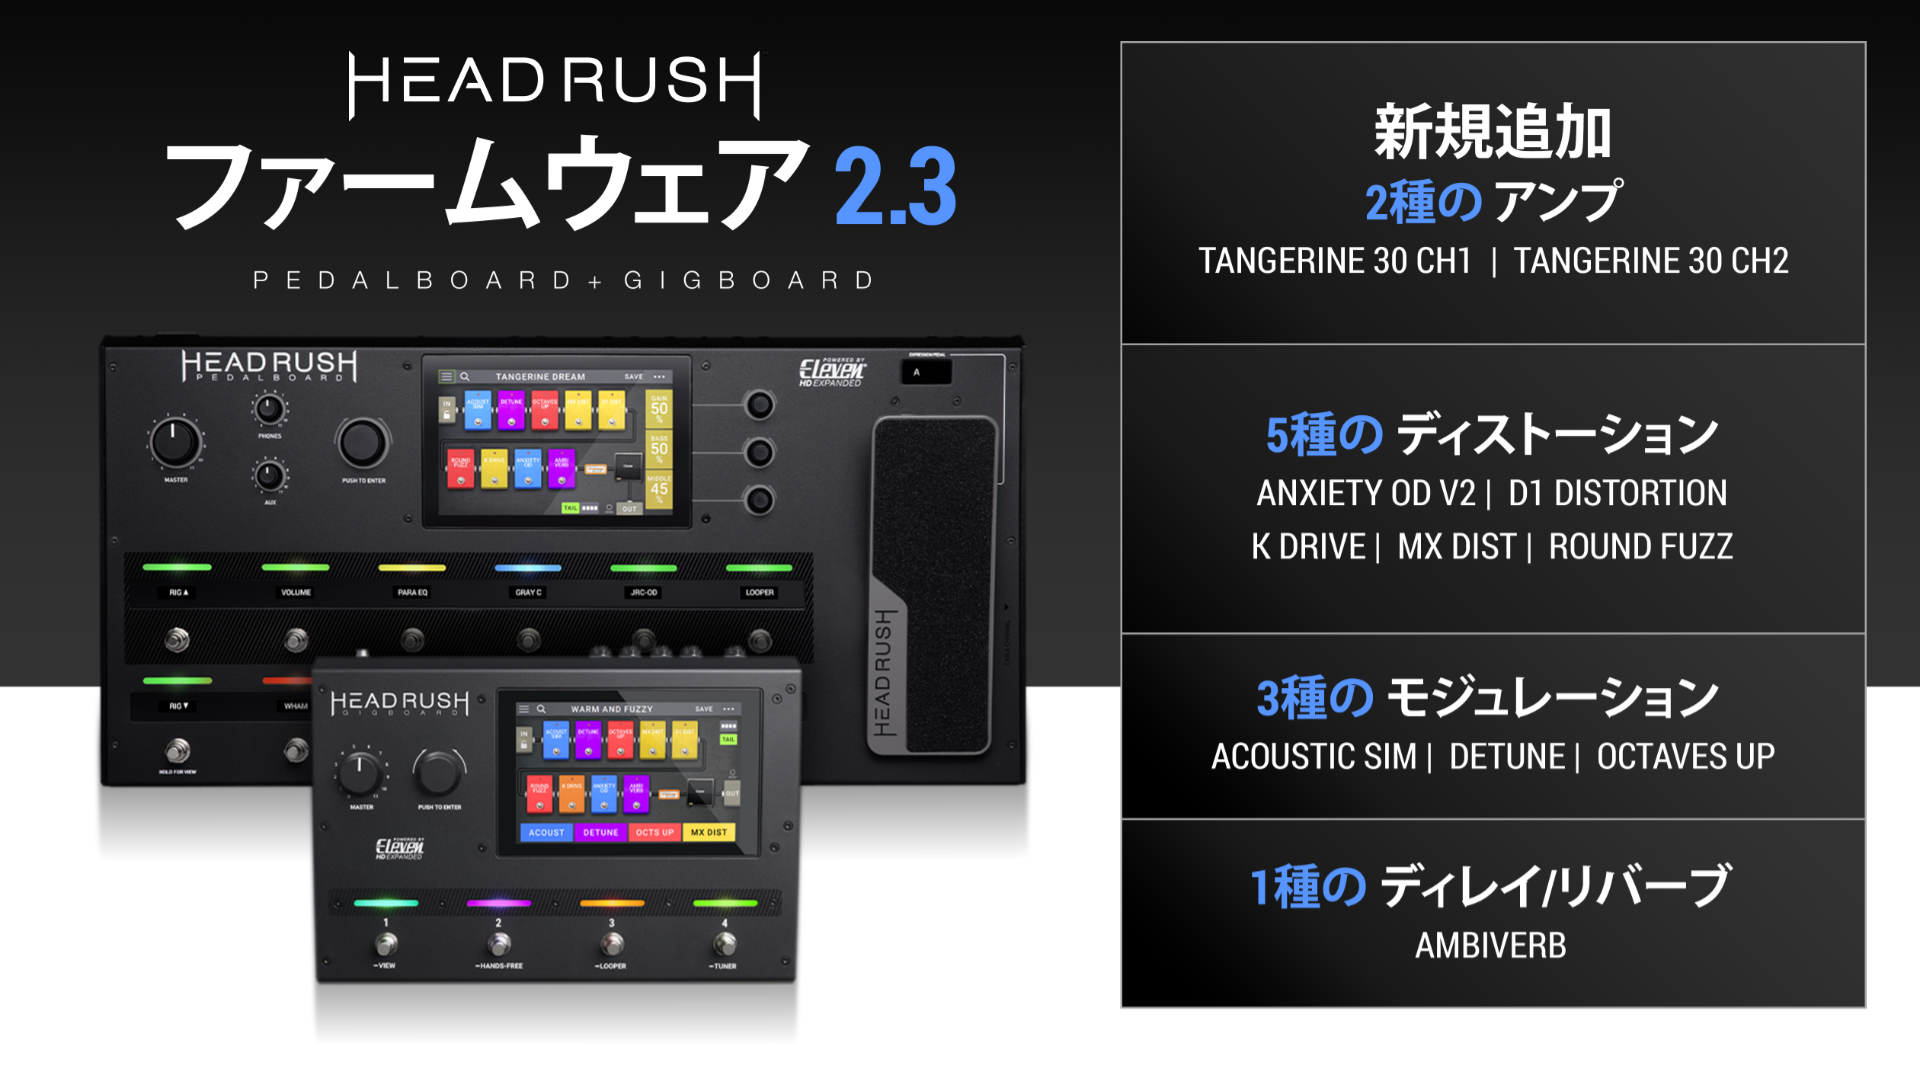 HeadRush feature update 2.3